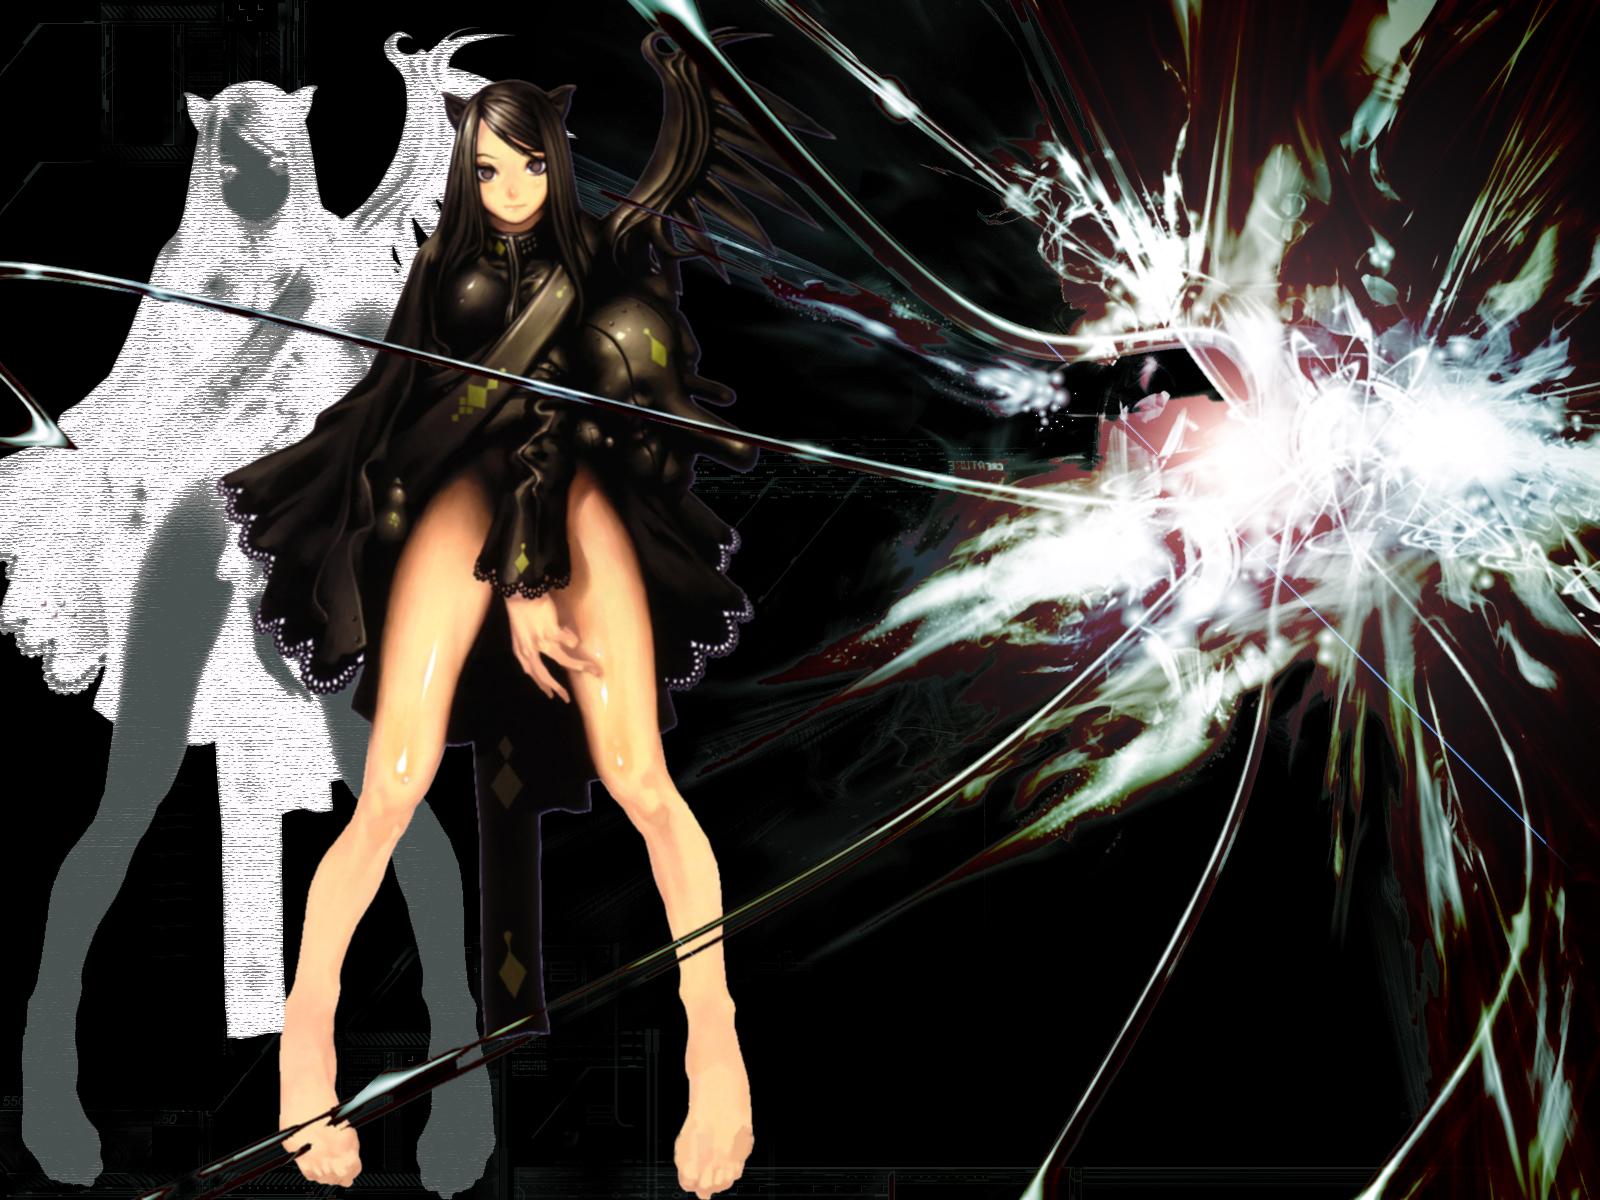 war of genesis 2 by Reanimat